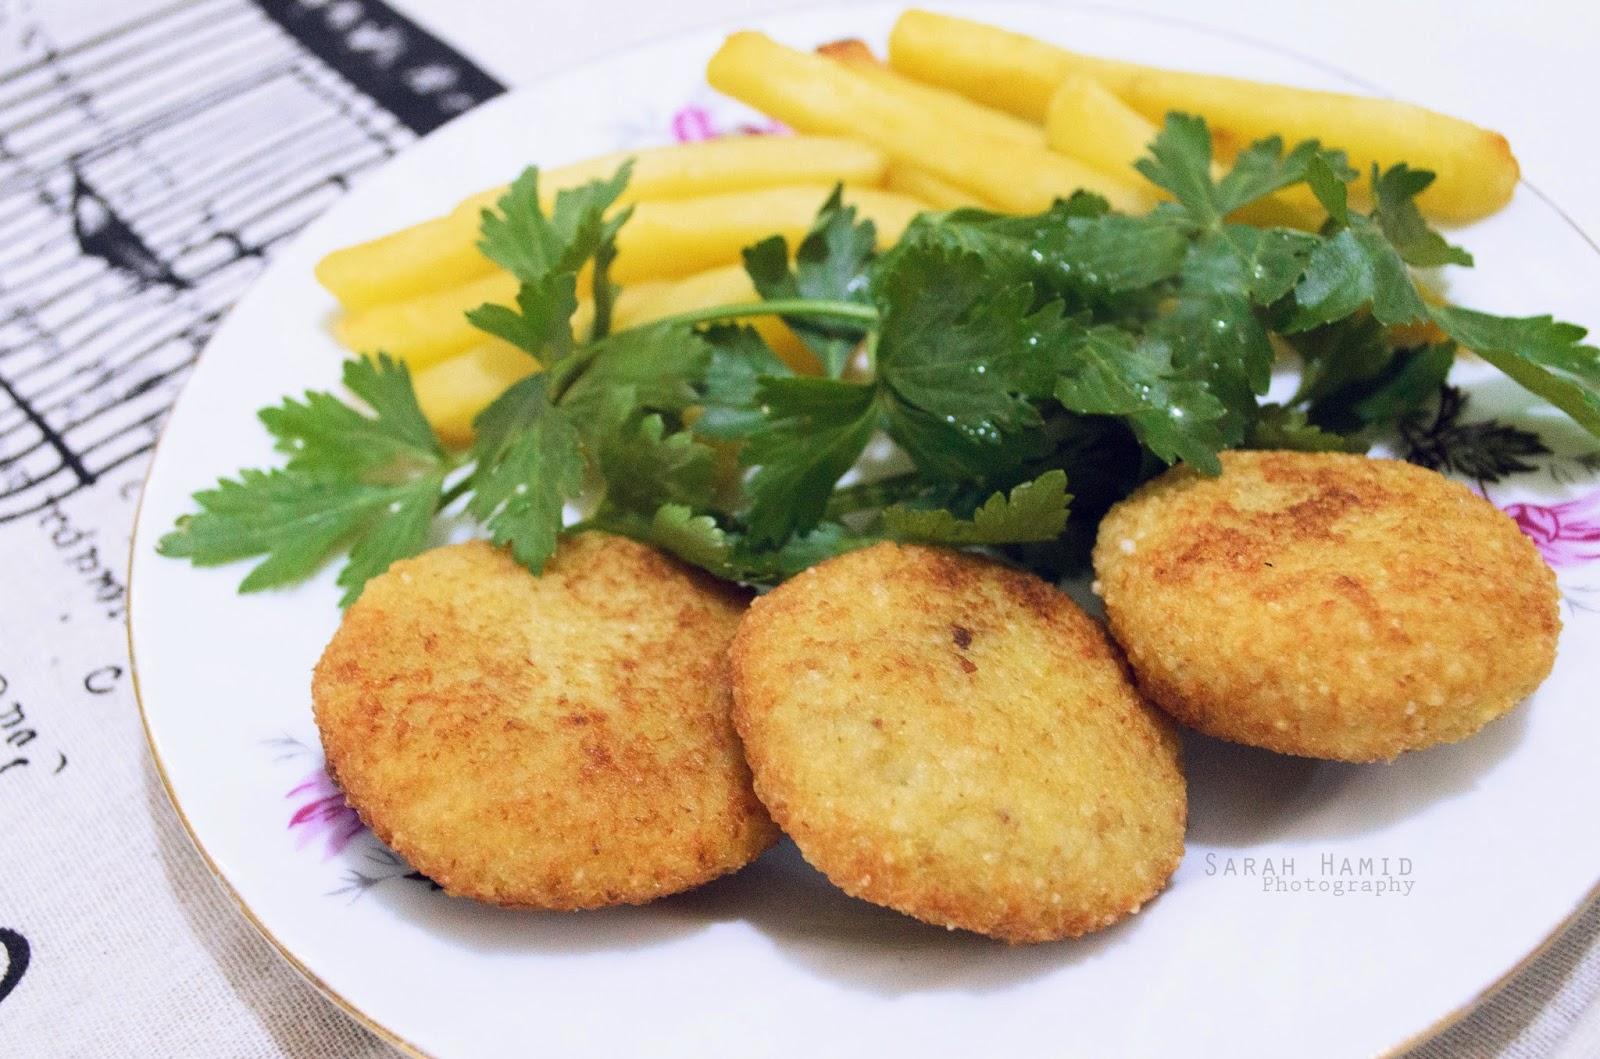 Bulgur kuba with egg arabic food sarah hamid bulgur kuba with egg arabiciraqi food forumfinder Images